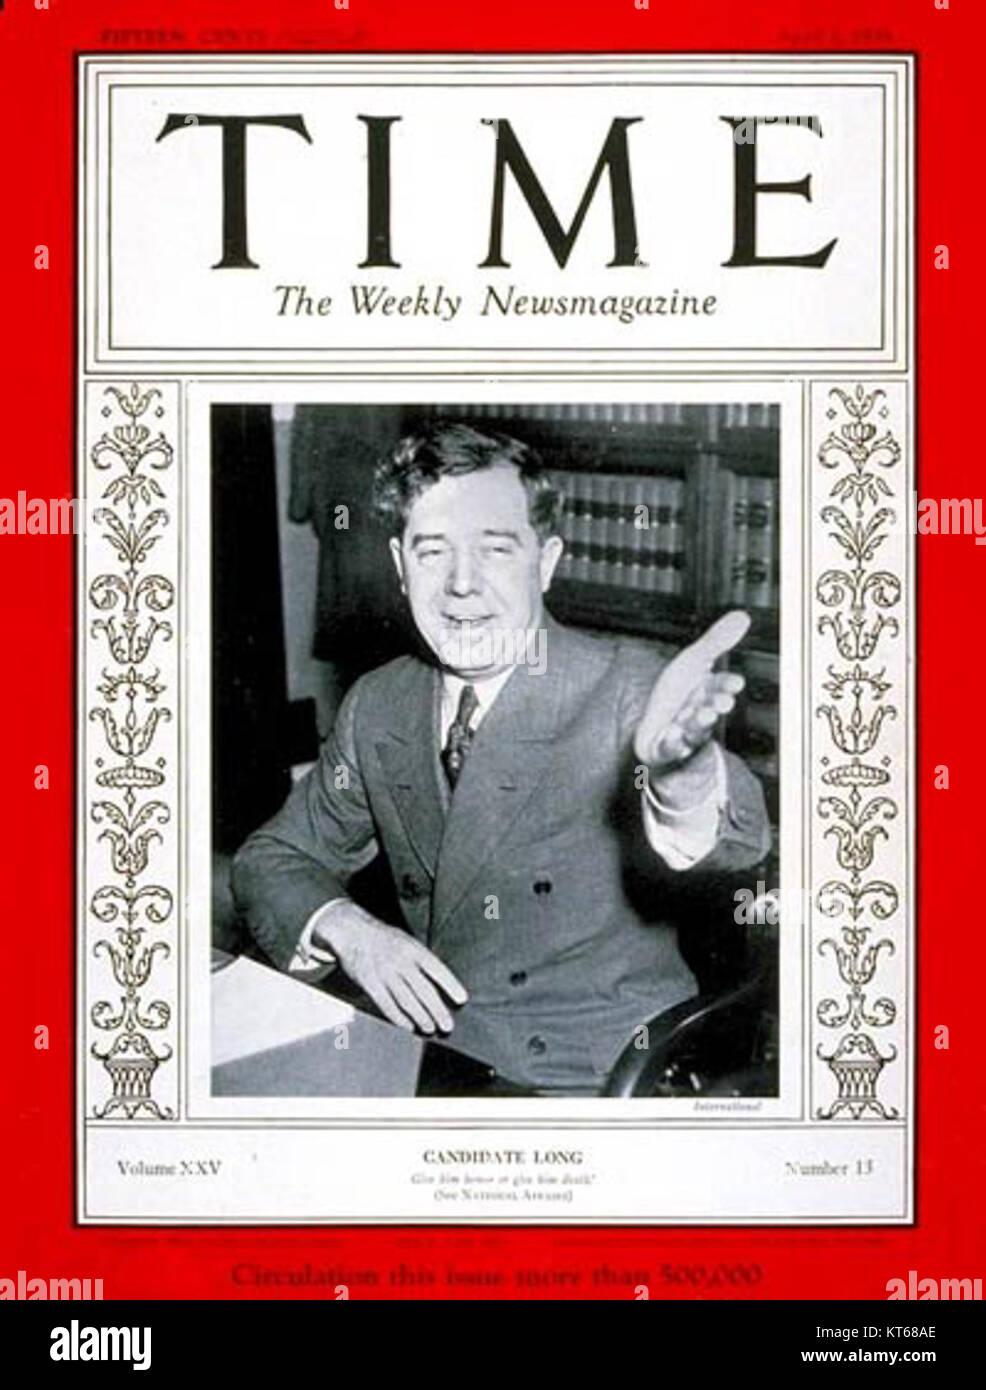 Time Magazine - Huey Long - Stock Image